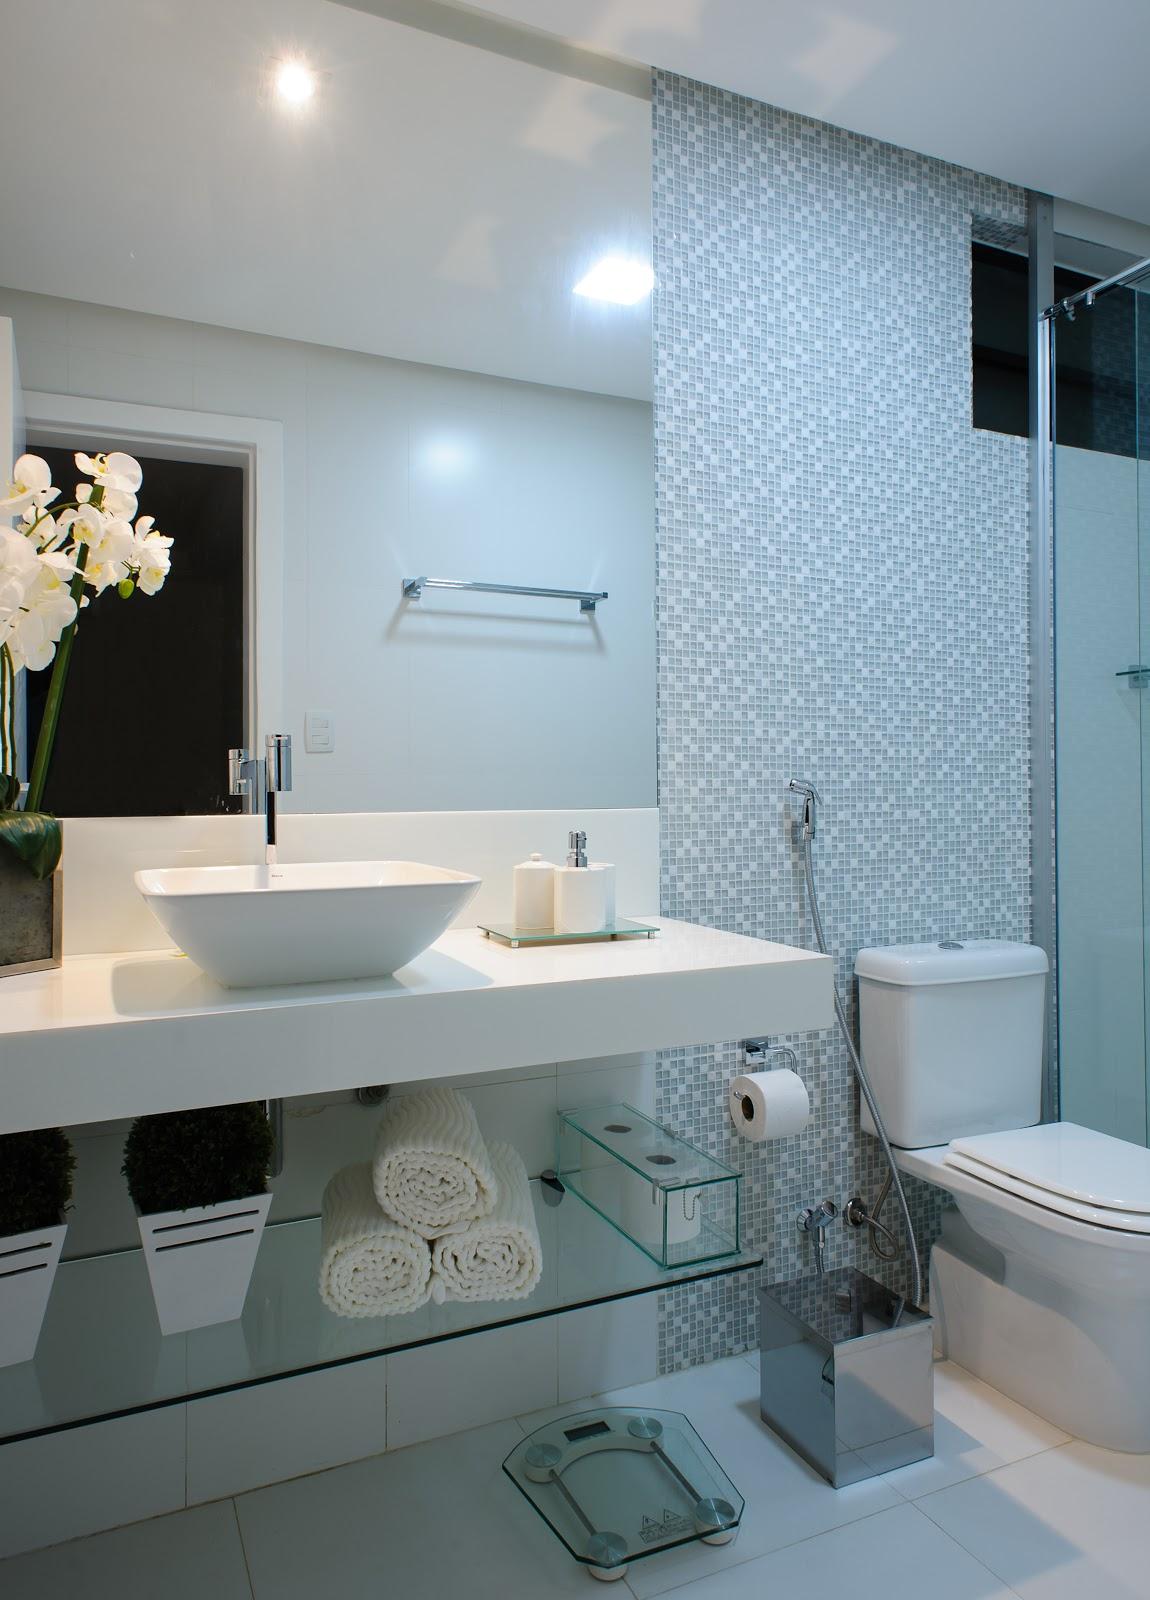 Michelle Goes Arquitetando Feedage 11715991 #4E6A7D 1150x1600 Bancada Banheiro Azul